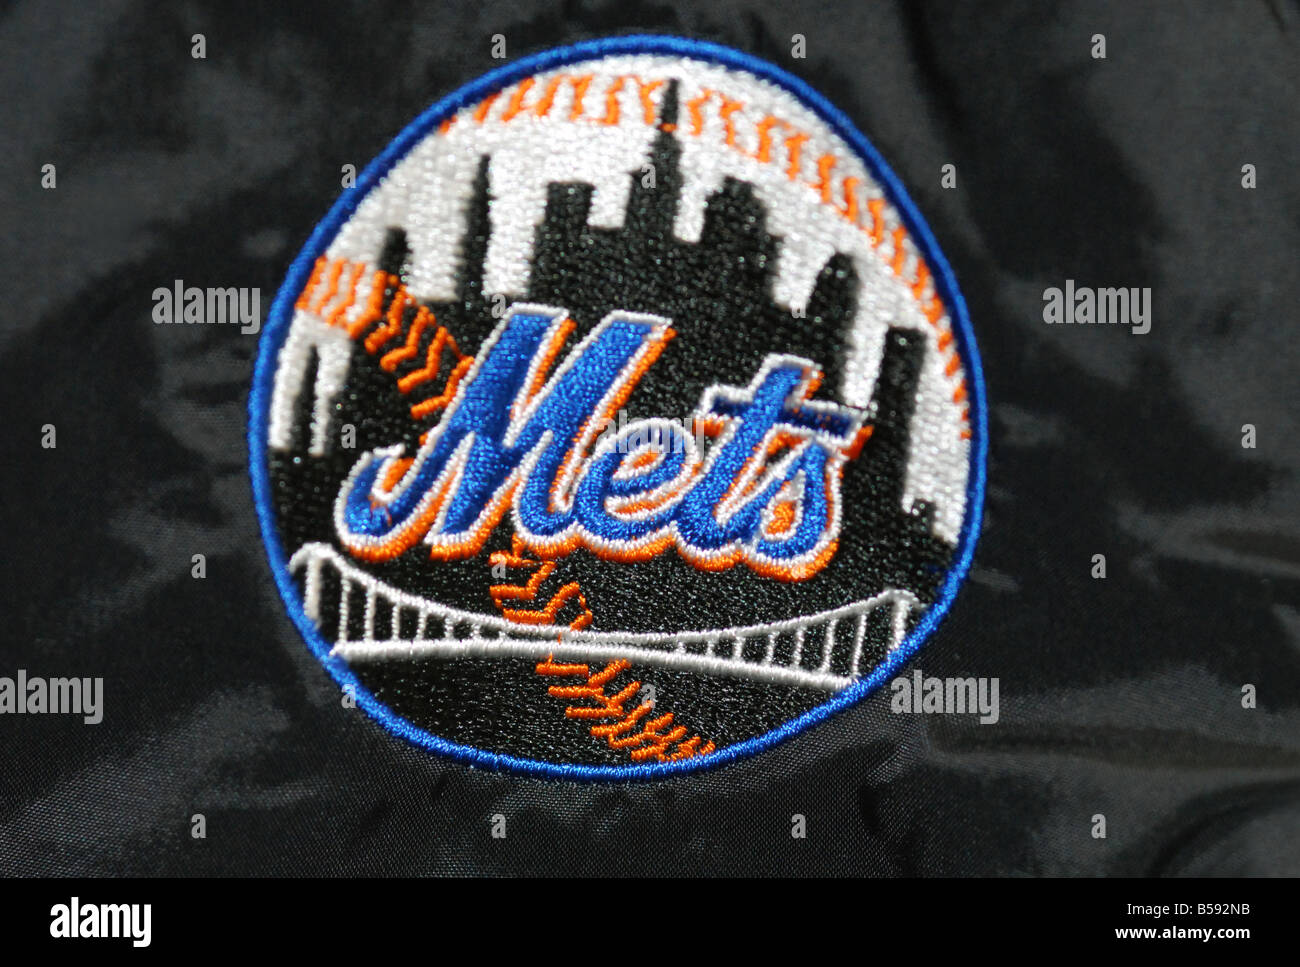 new york mets logo stock photos new york mets logo stock images